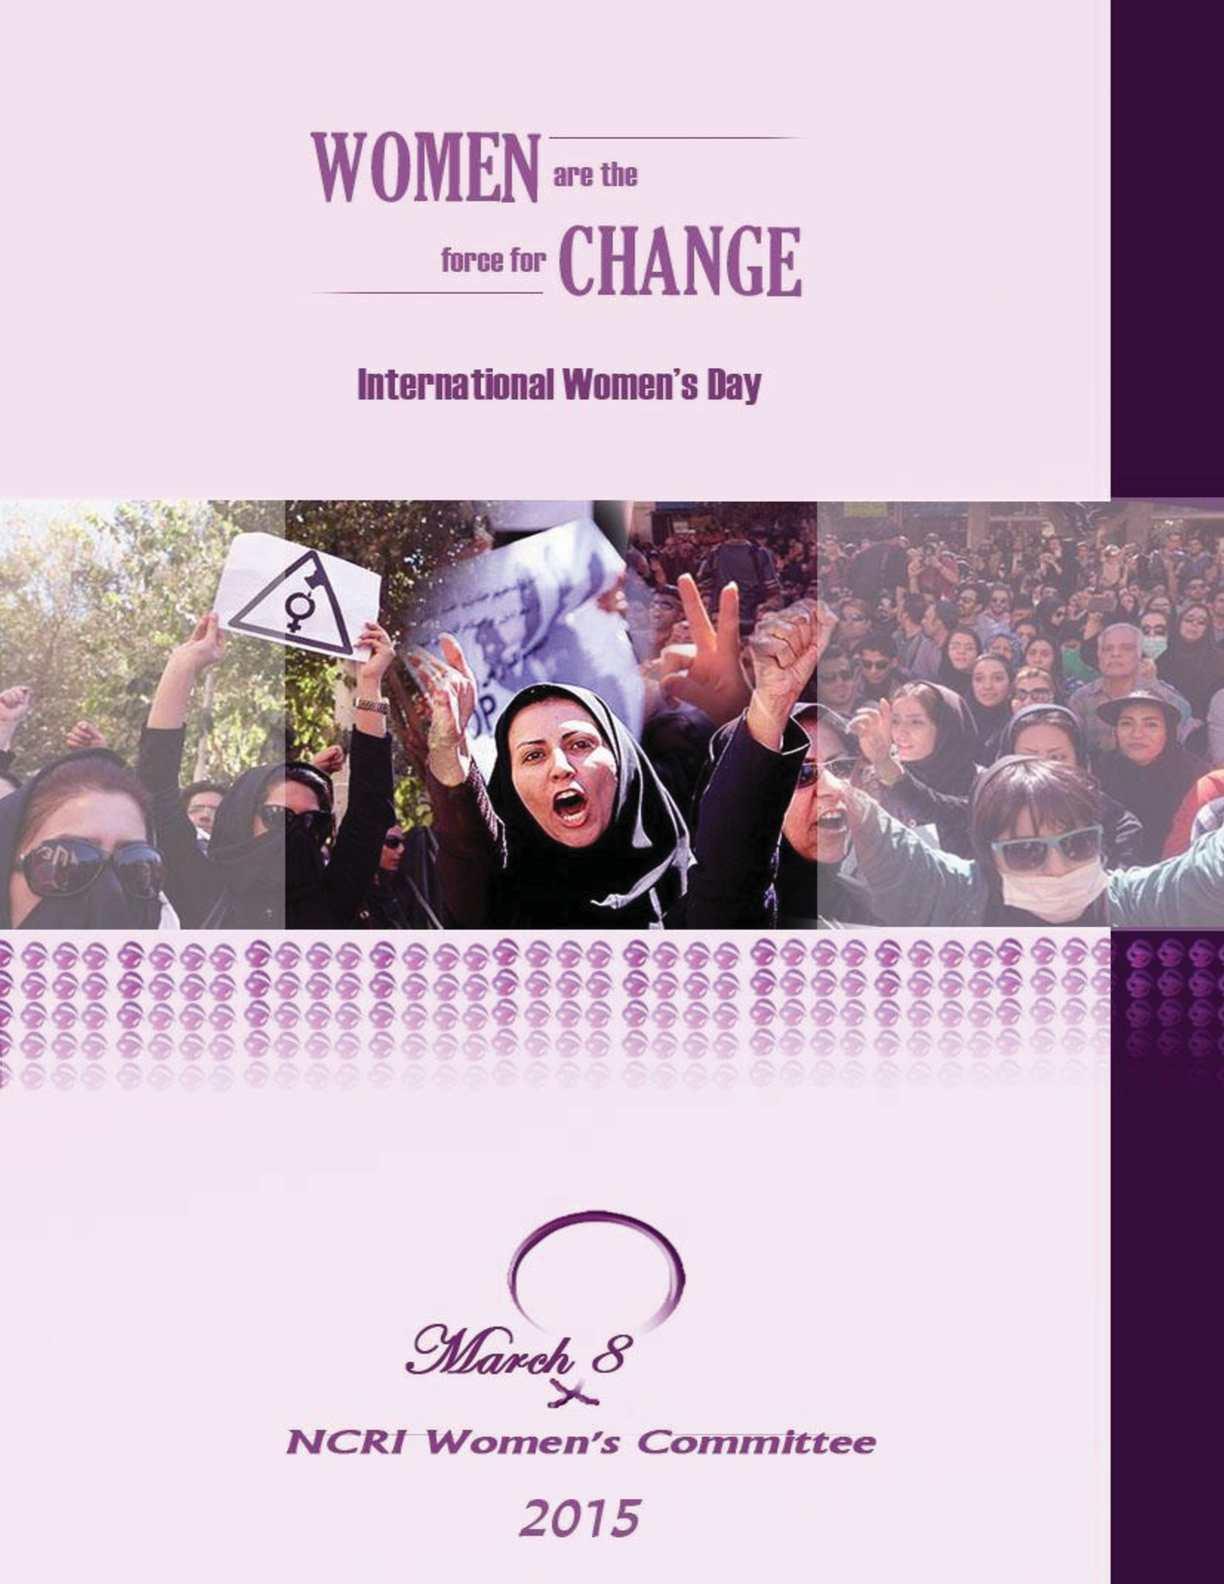 Calaméo - Ncri Women's Committee book 2015